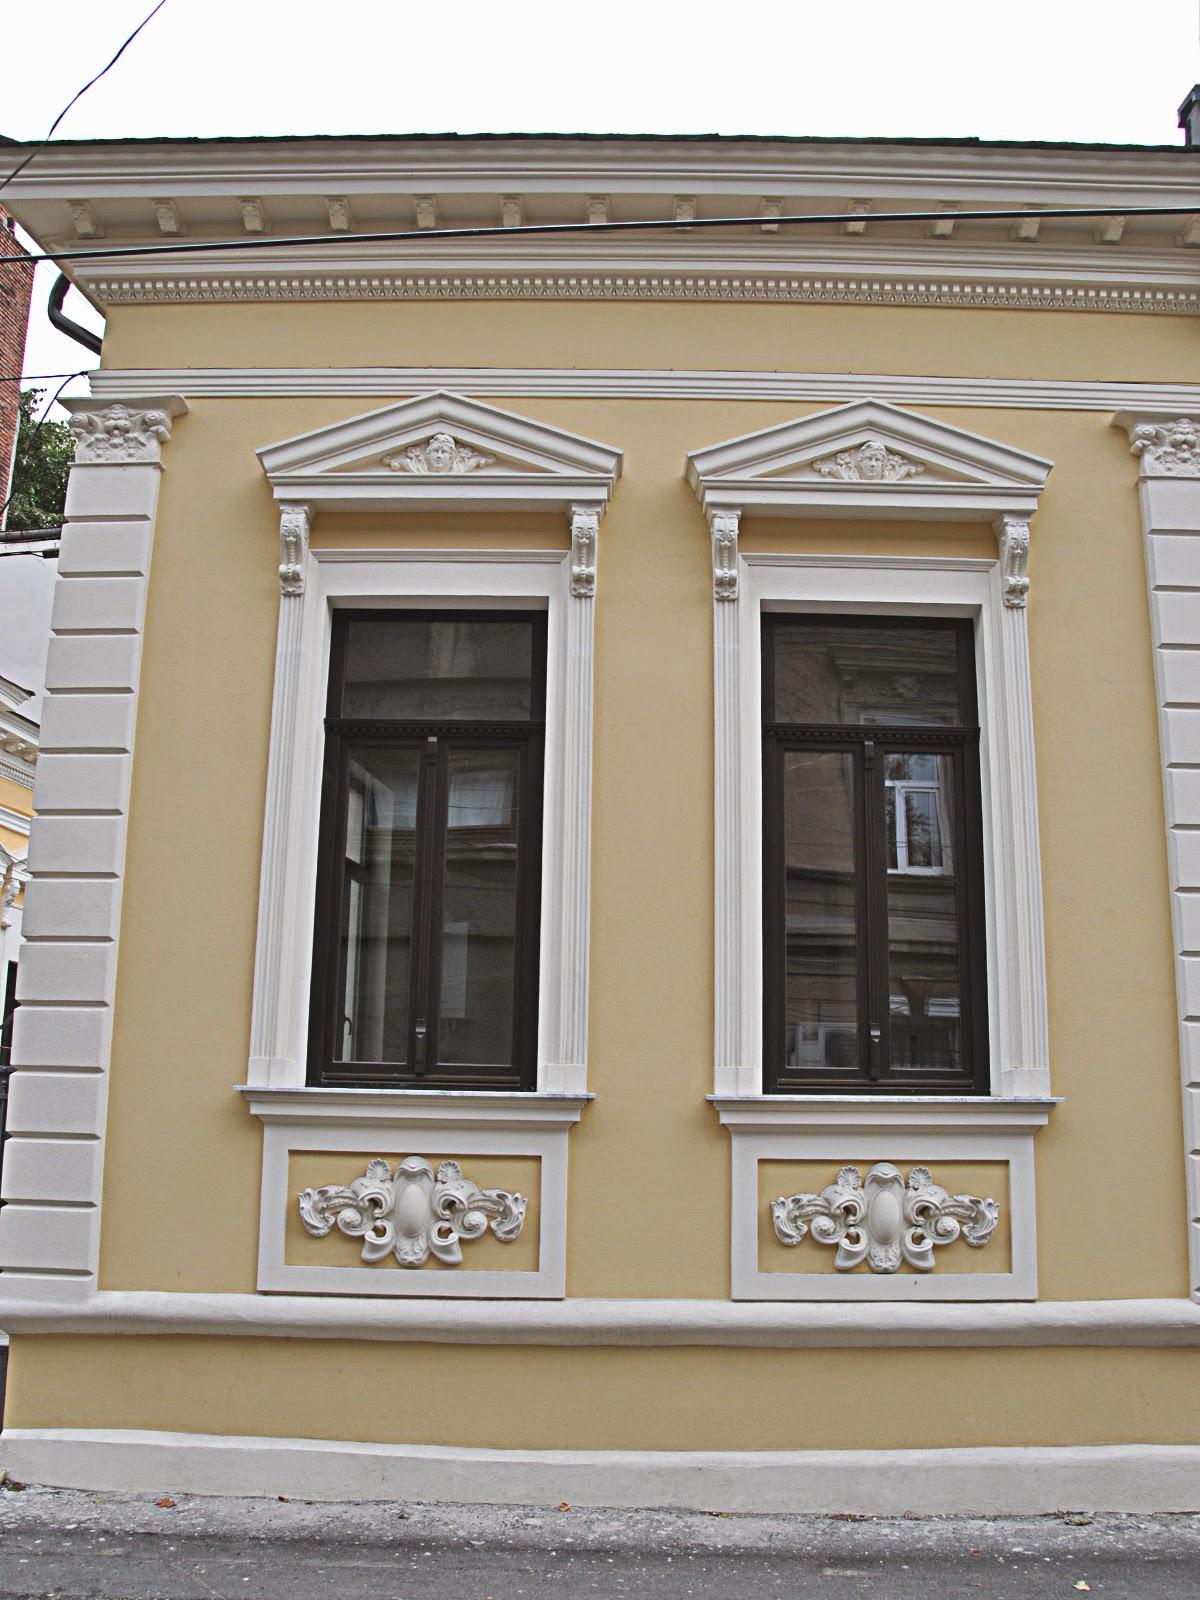 renovare case vechi cu profile polistiren, case vechi cu fronton